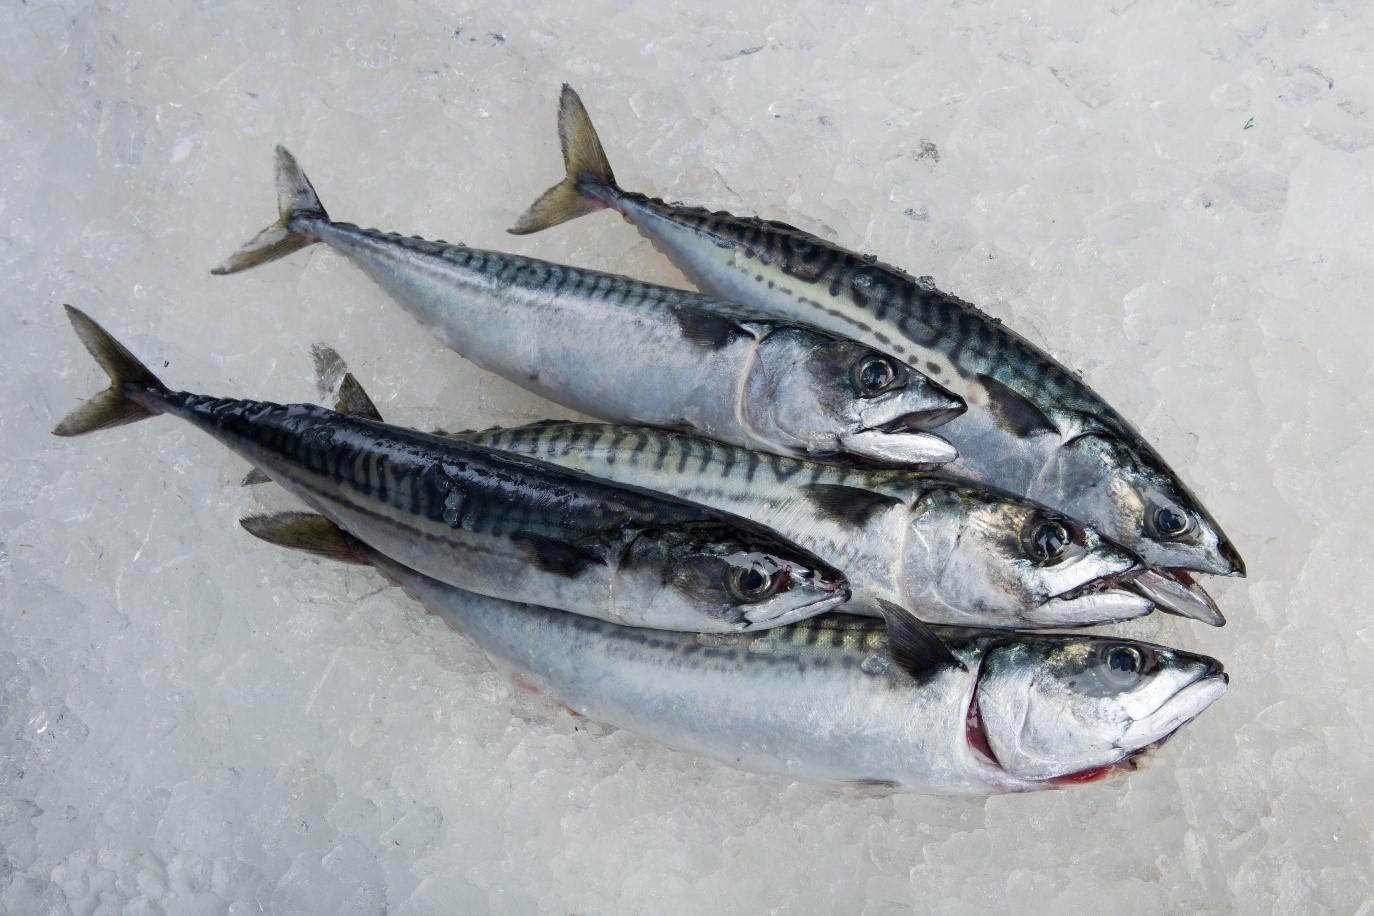 Mackerel Fish from Flying Fish at Home